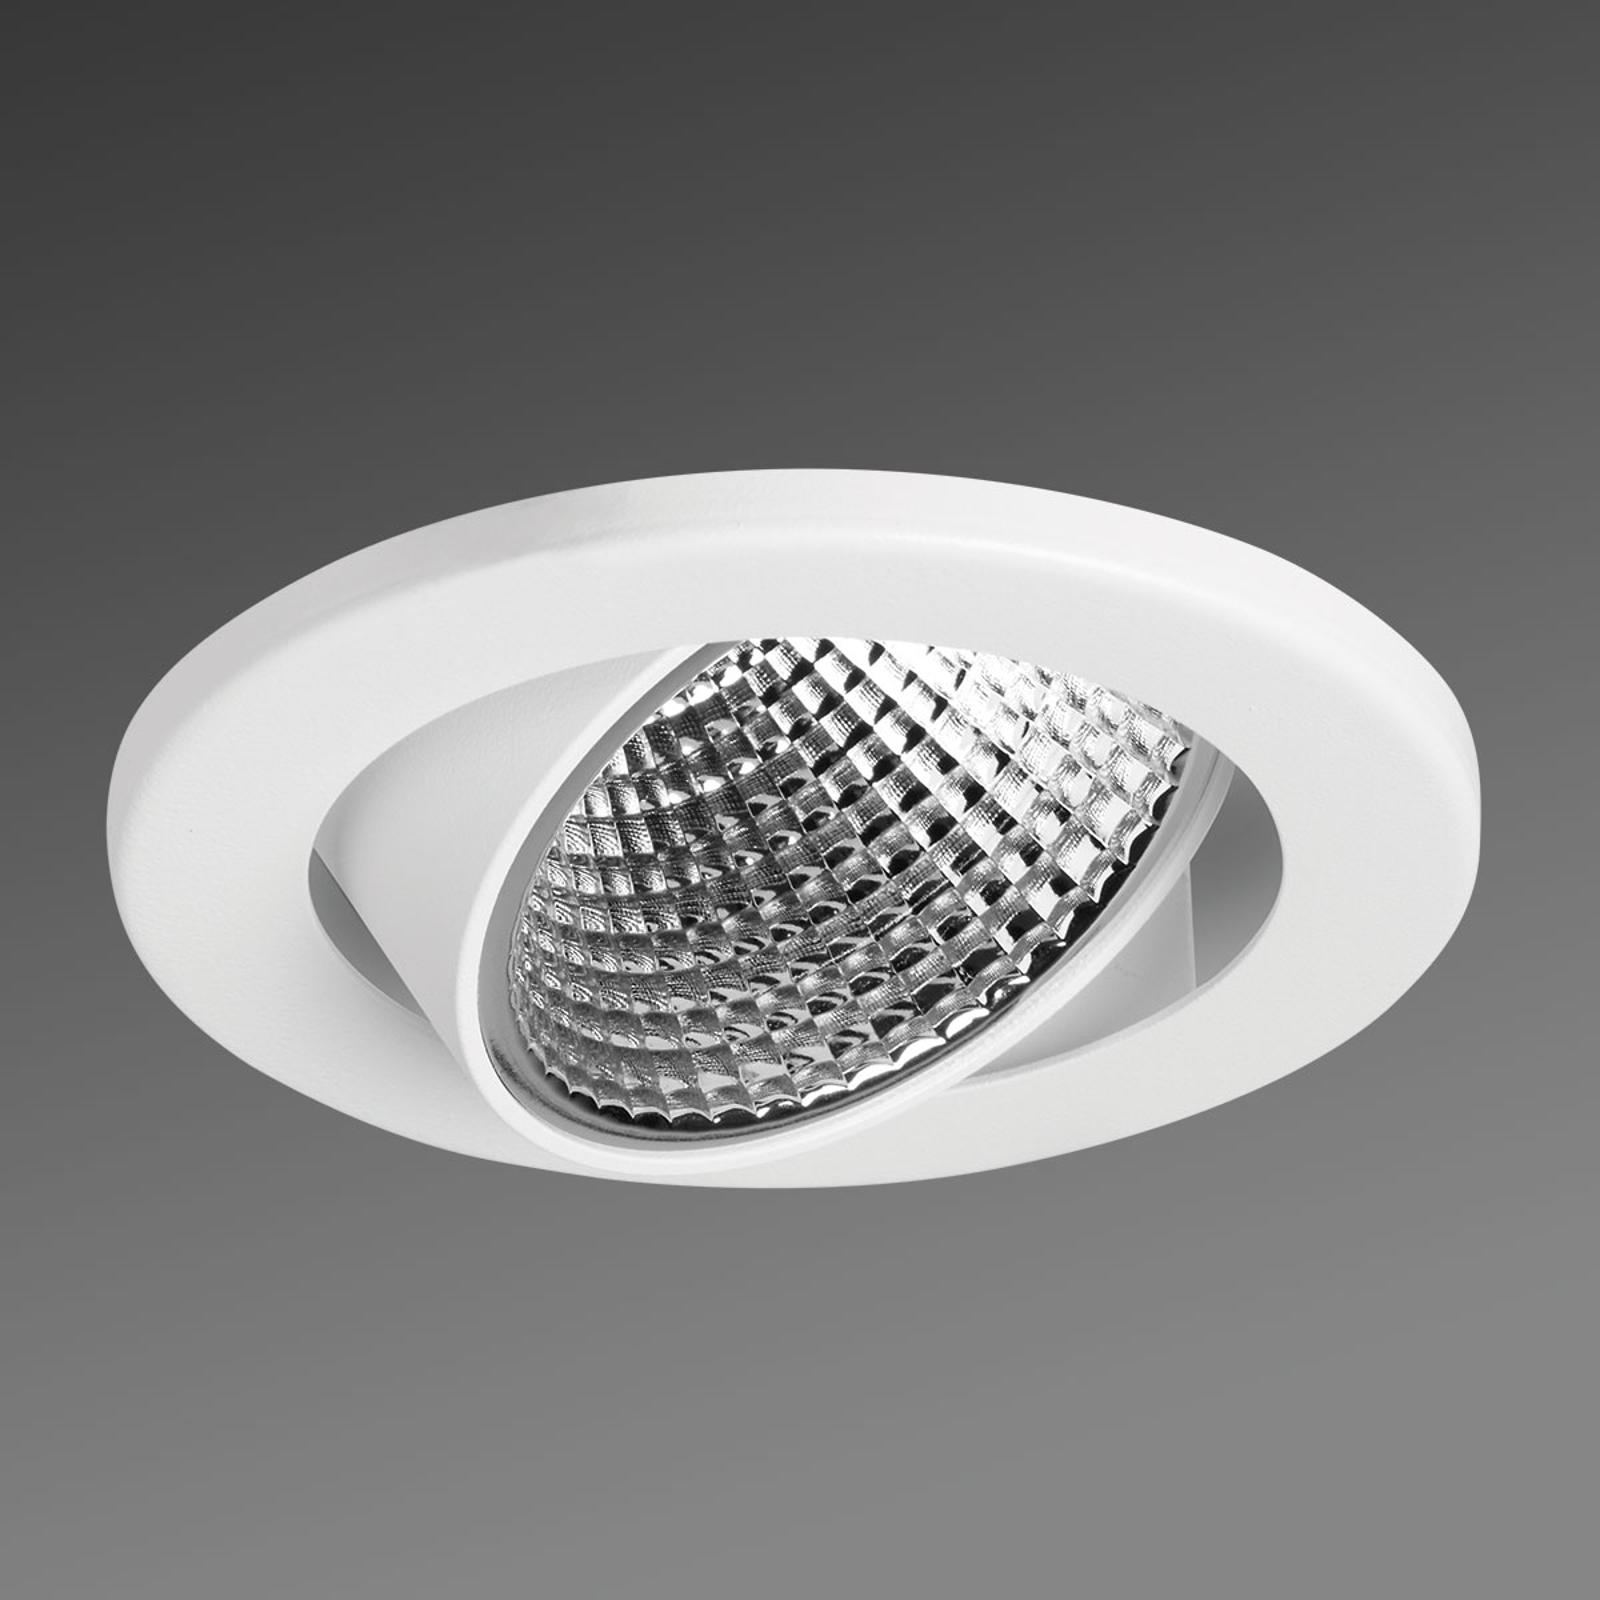 LED-downlight Zipar justerbar 12 W 4000K